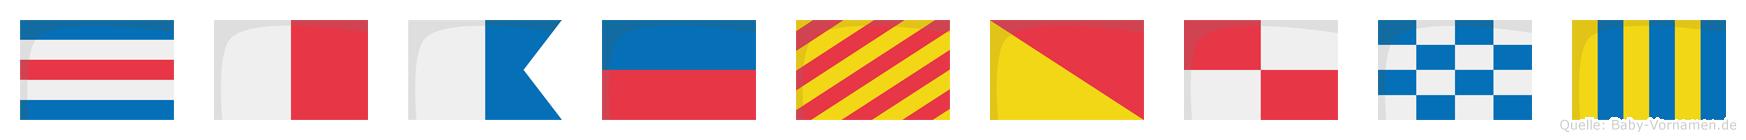 Chaeyoung im Flaggenalphabet